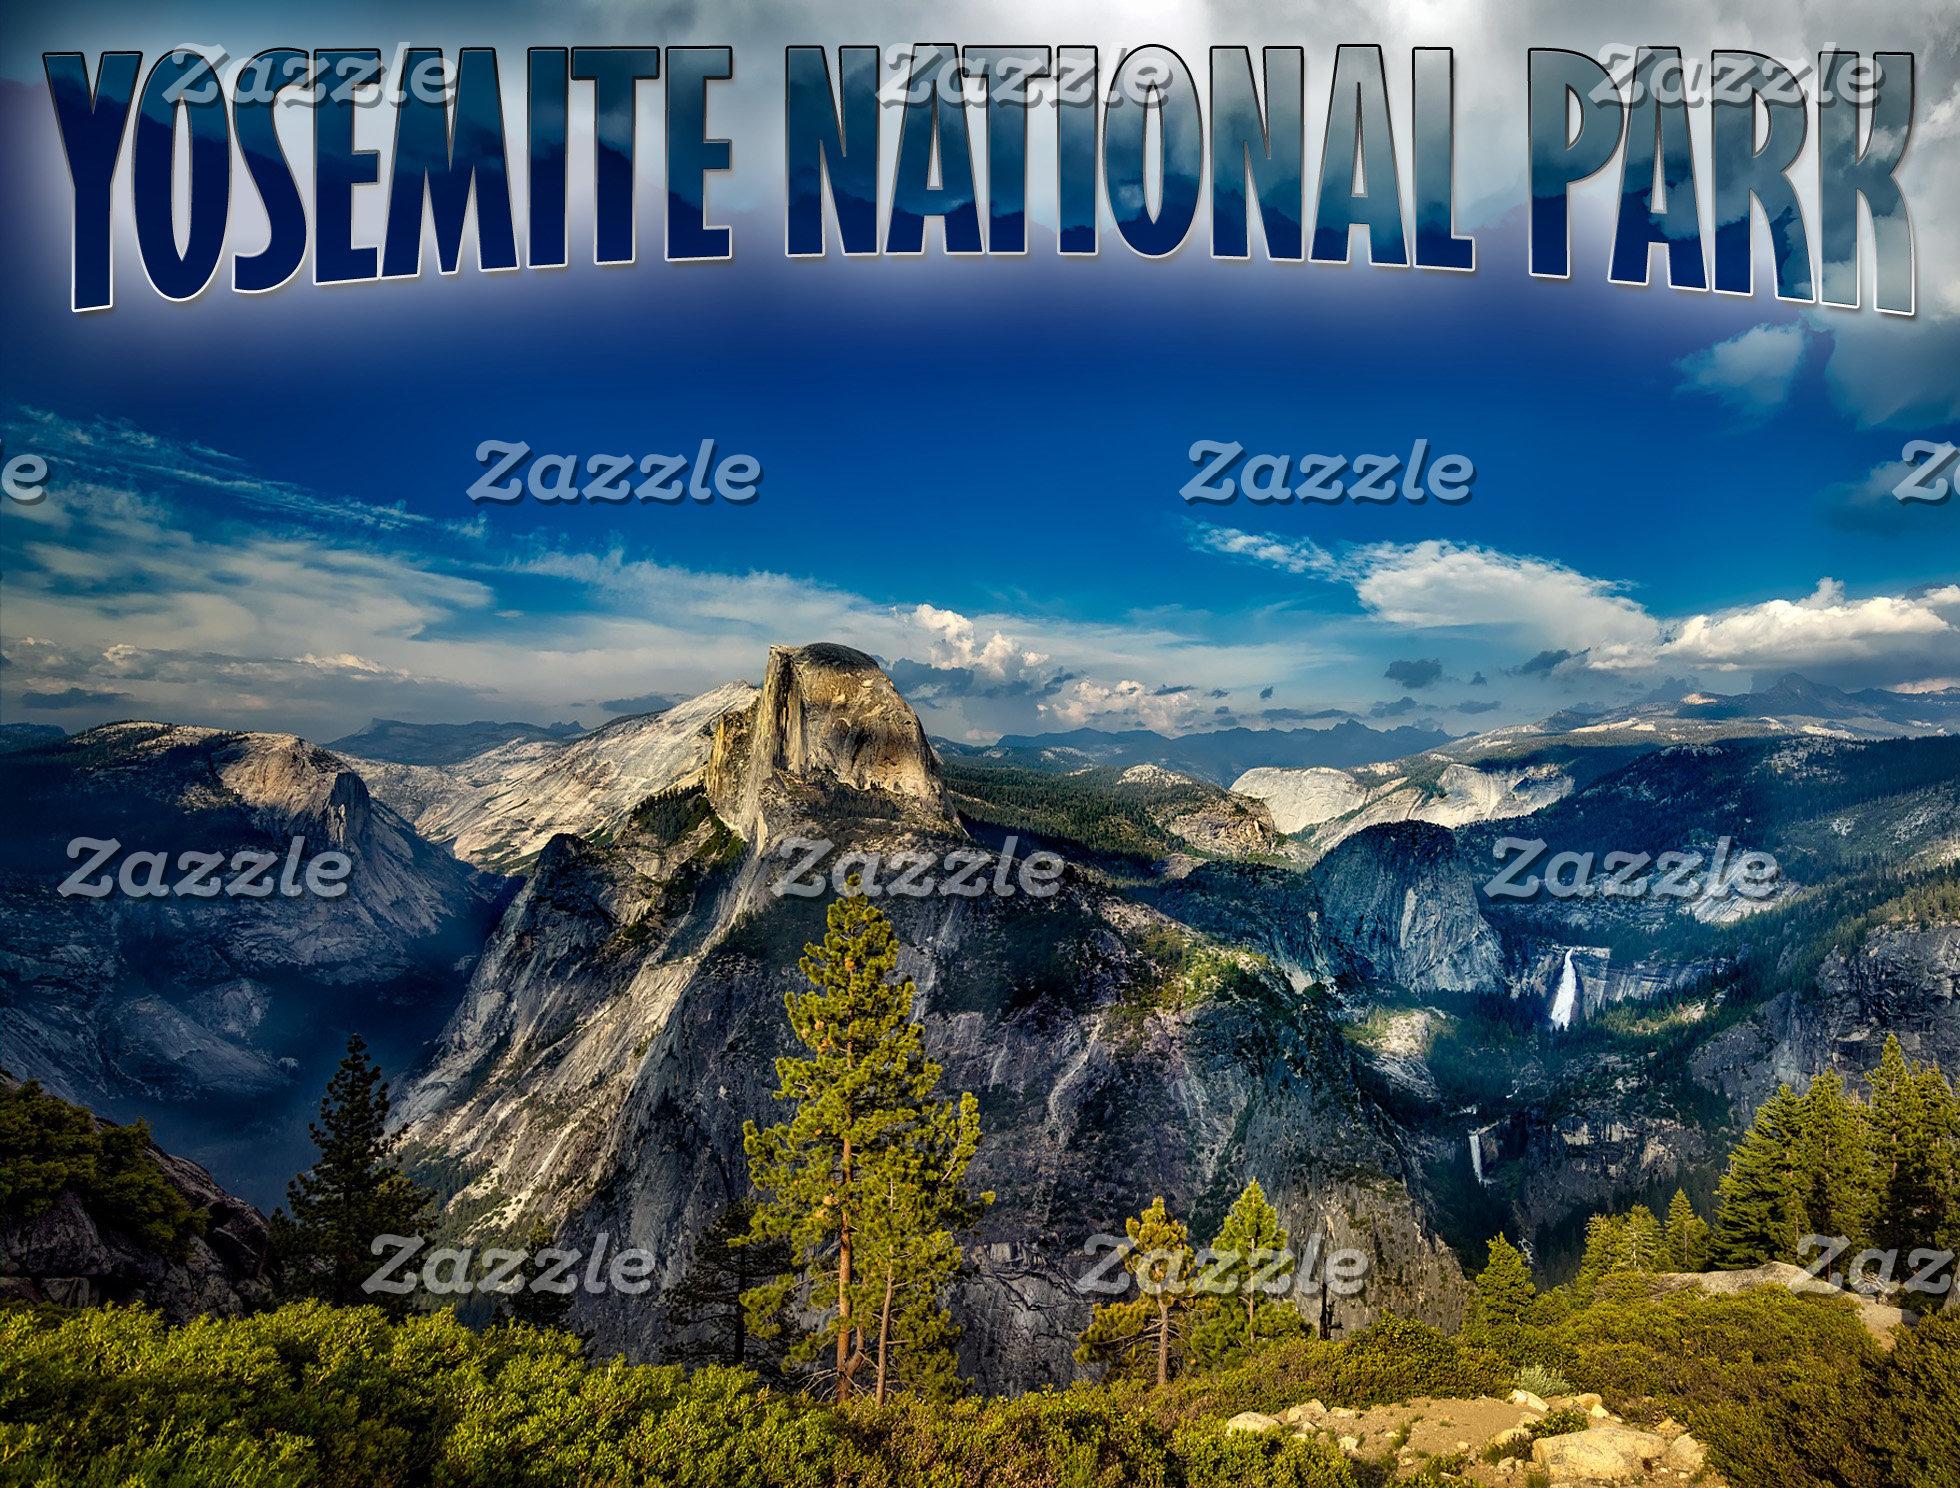 Yosemite National Park, California (USA)